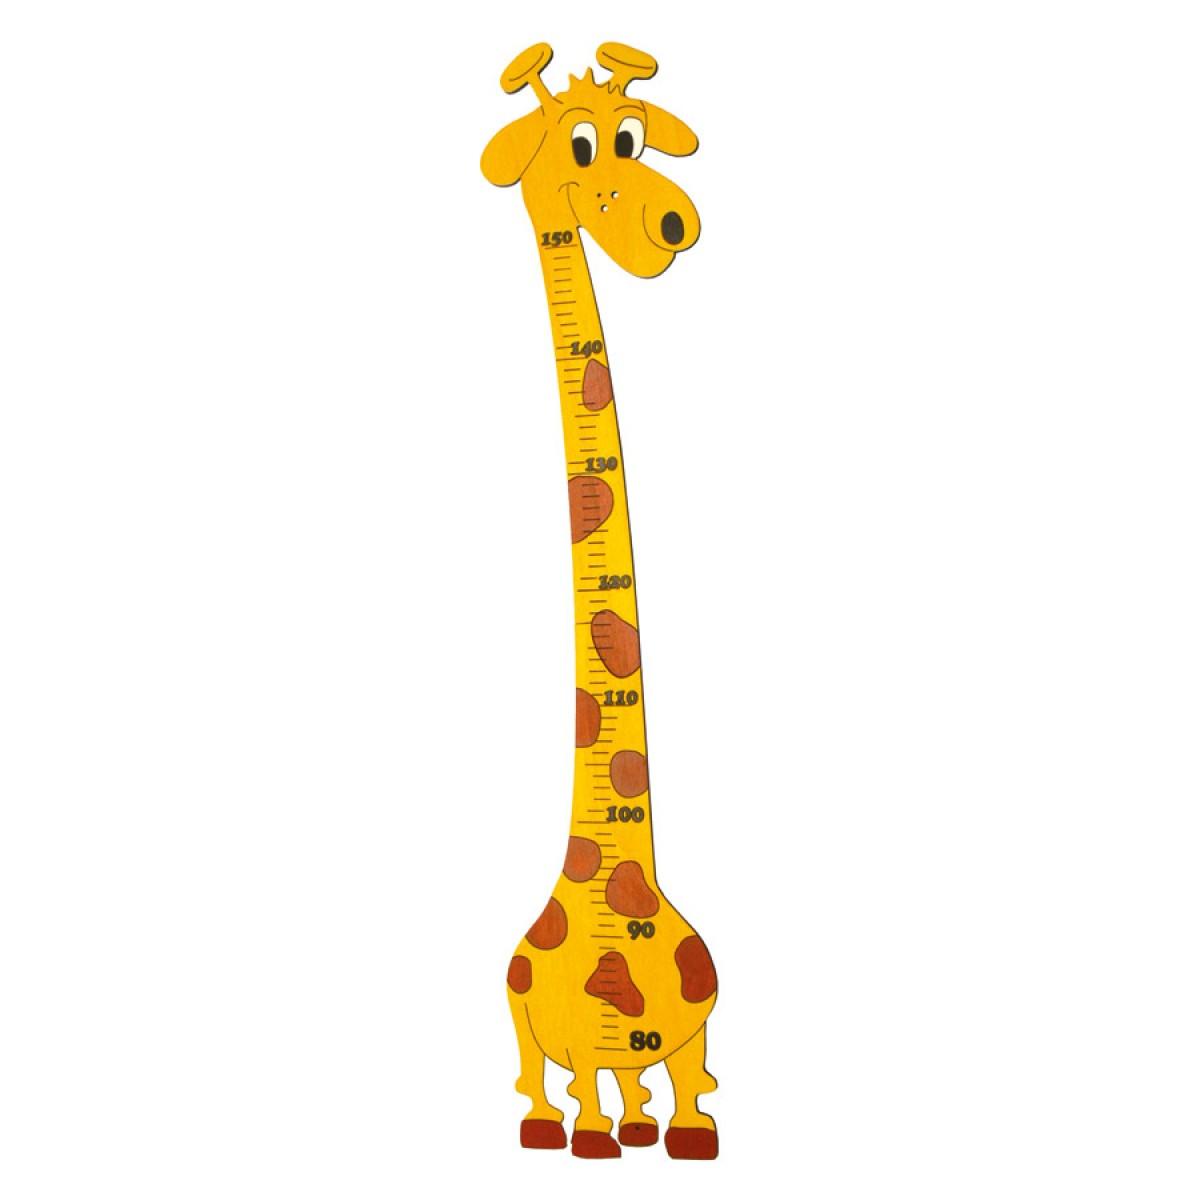 Full Size of Messlatte Kinderzimmer Giraffe Kindermesslatte Vom Holzspielzeug Profi Regal Weiß Sofa Regale Kinderzimmer Messlatte Kinderzimmer